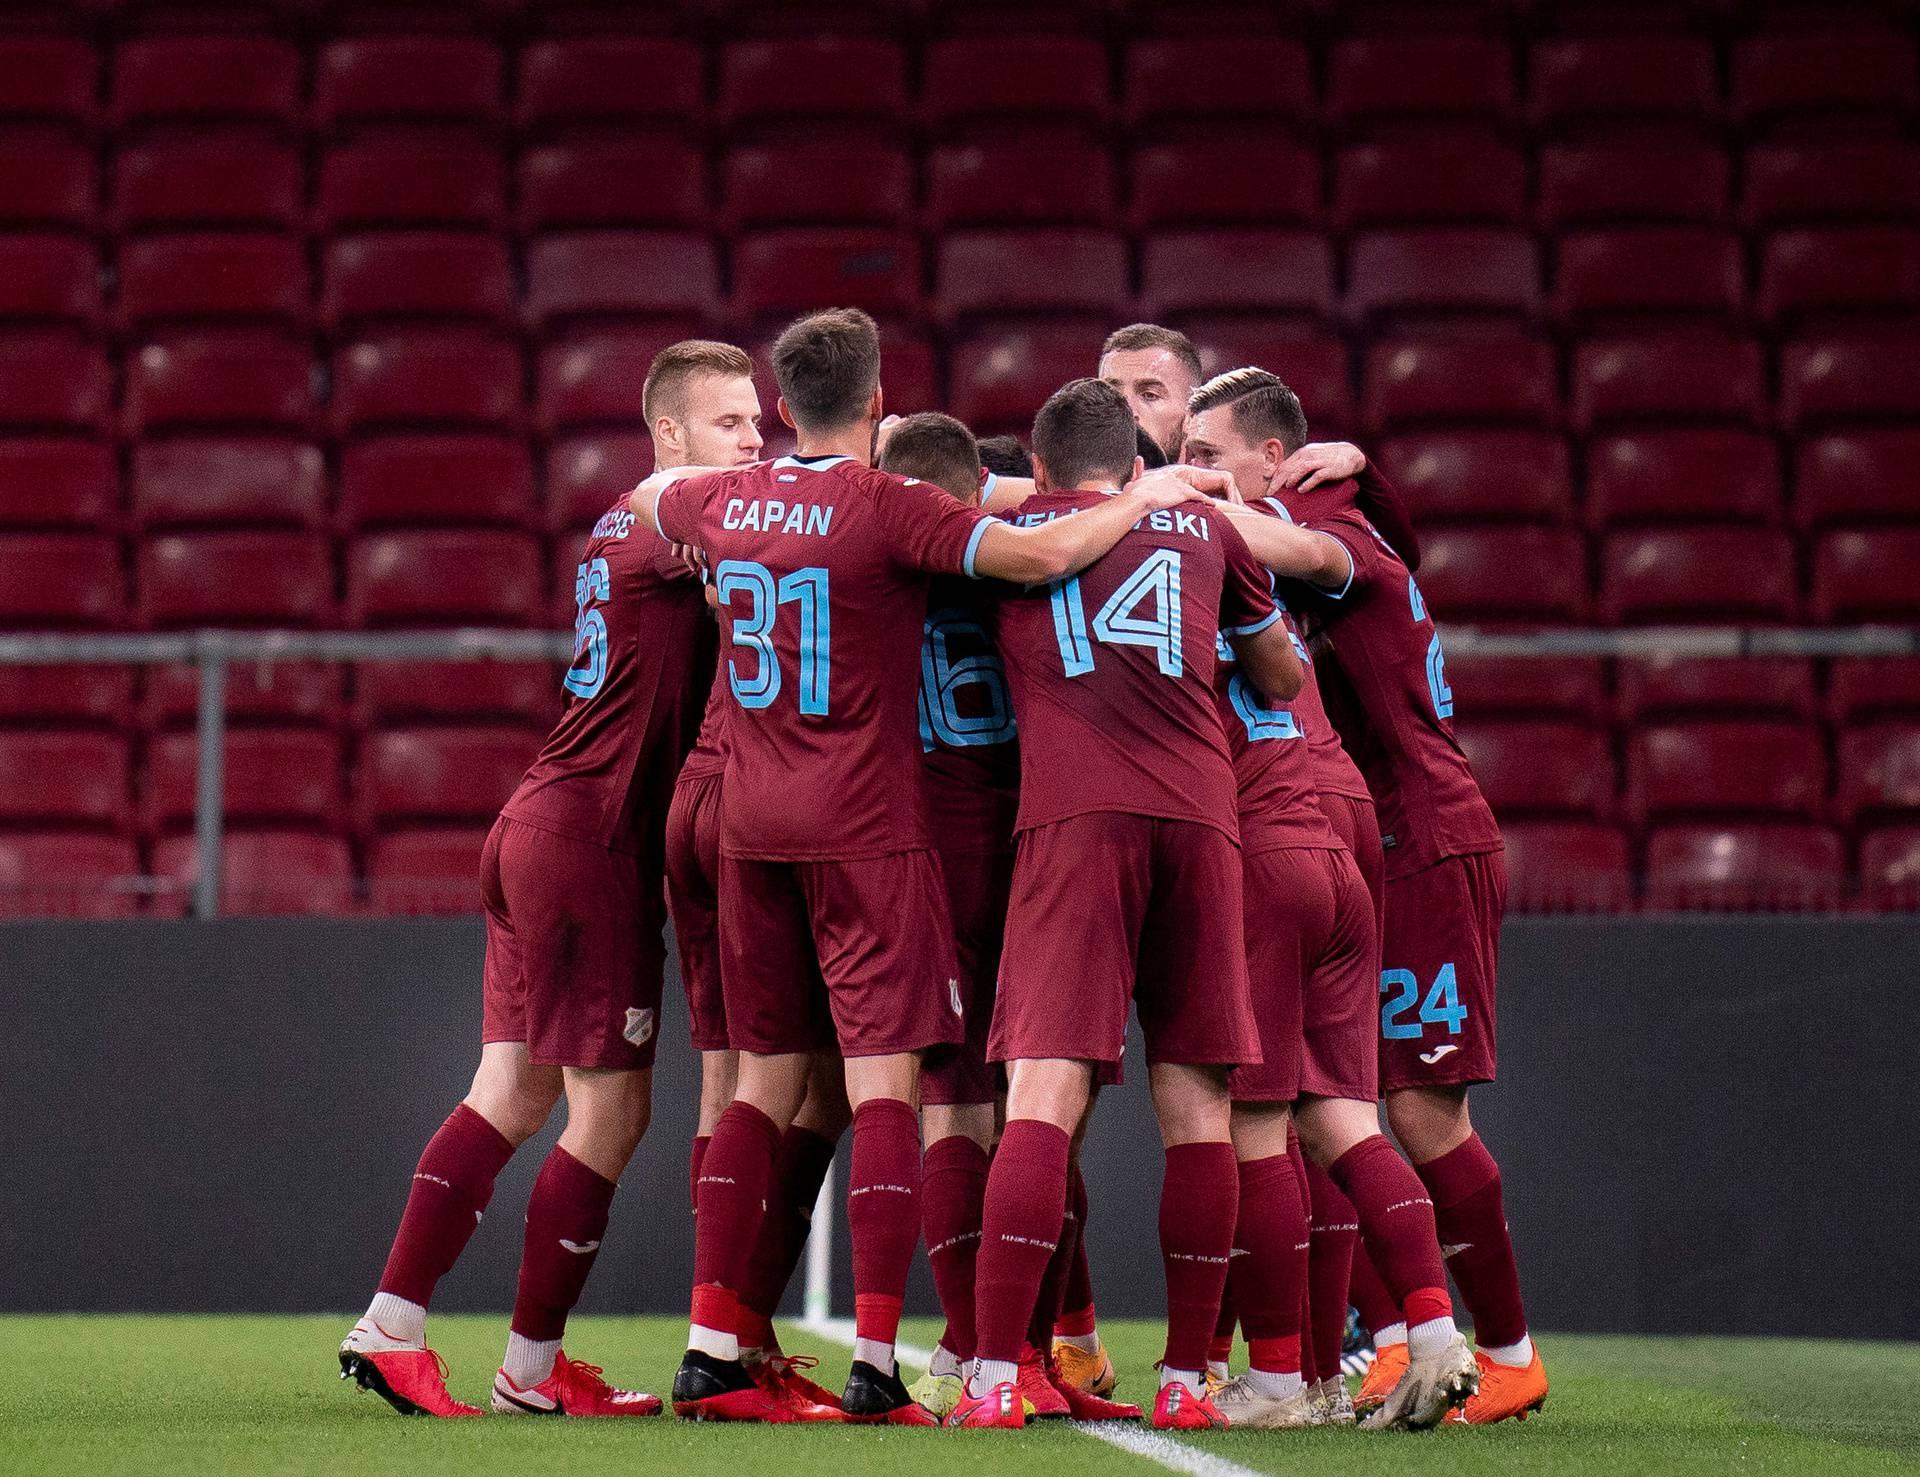 Europa League - Play-off - FC Copenhagen v HNK Rijeka